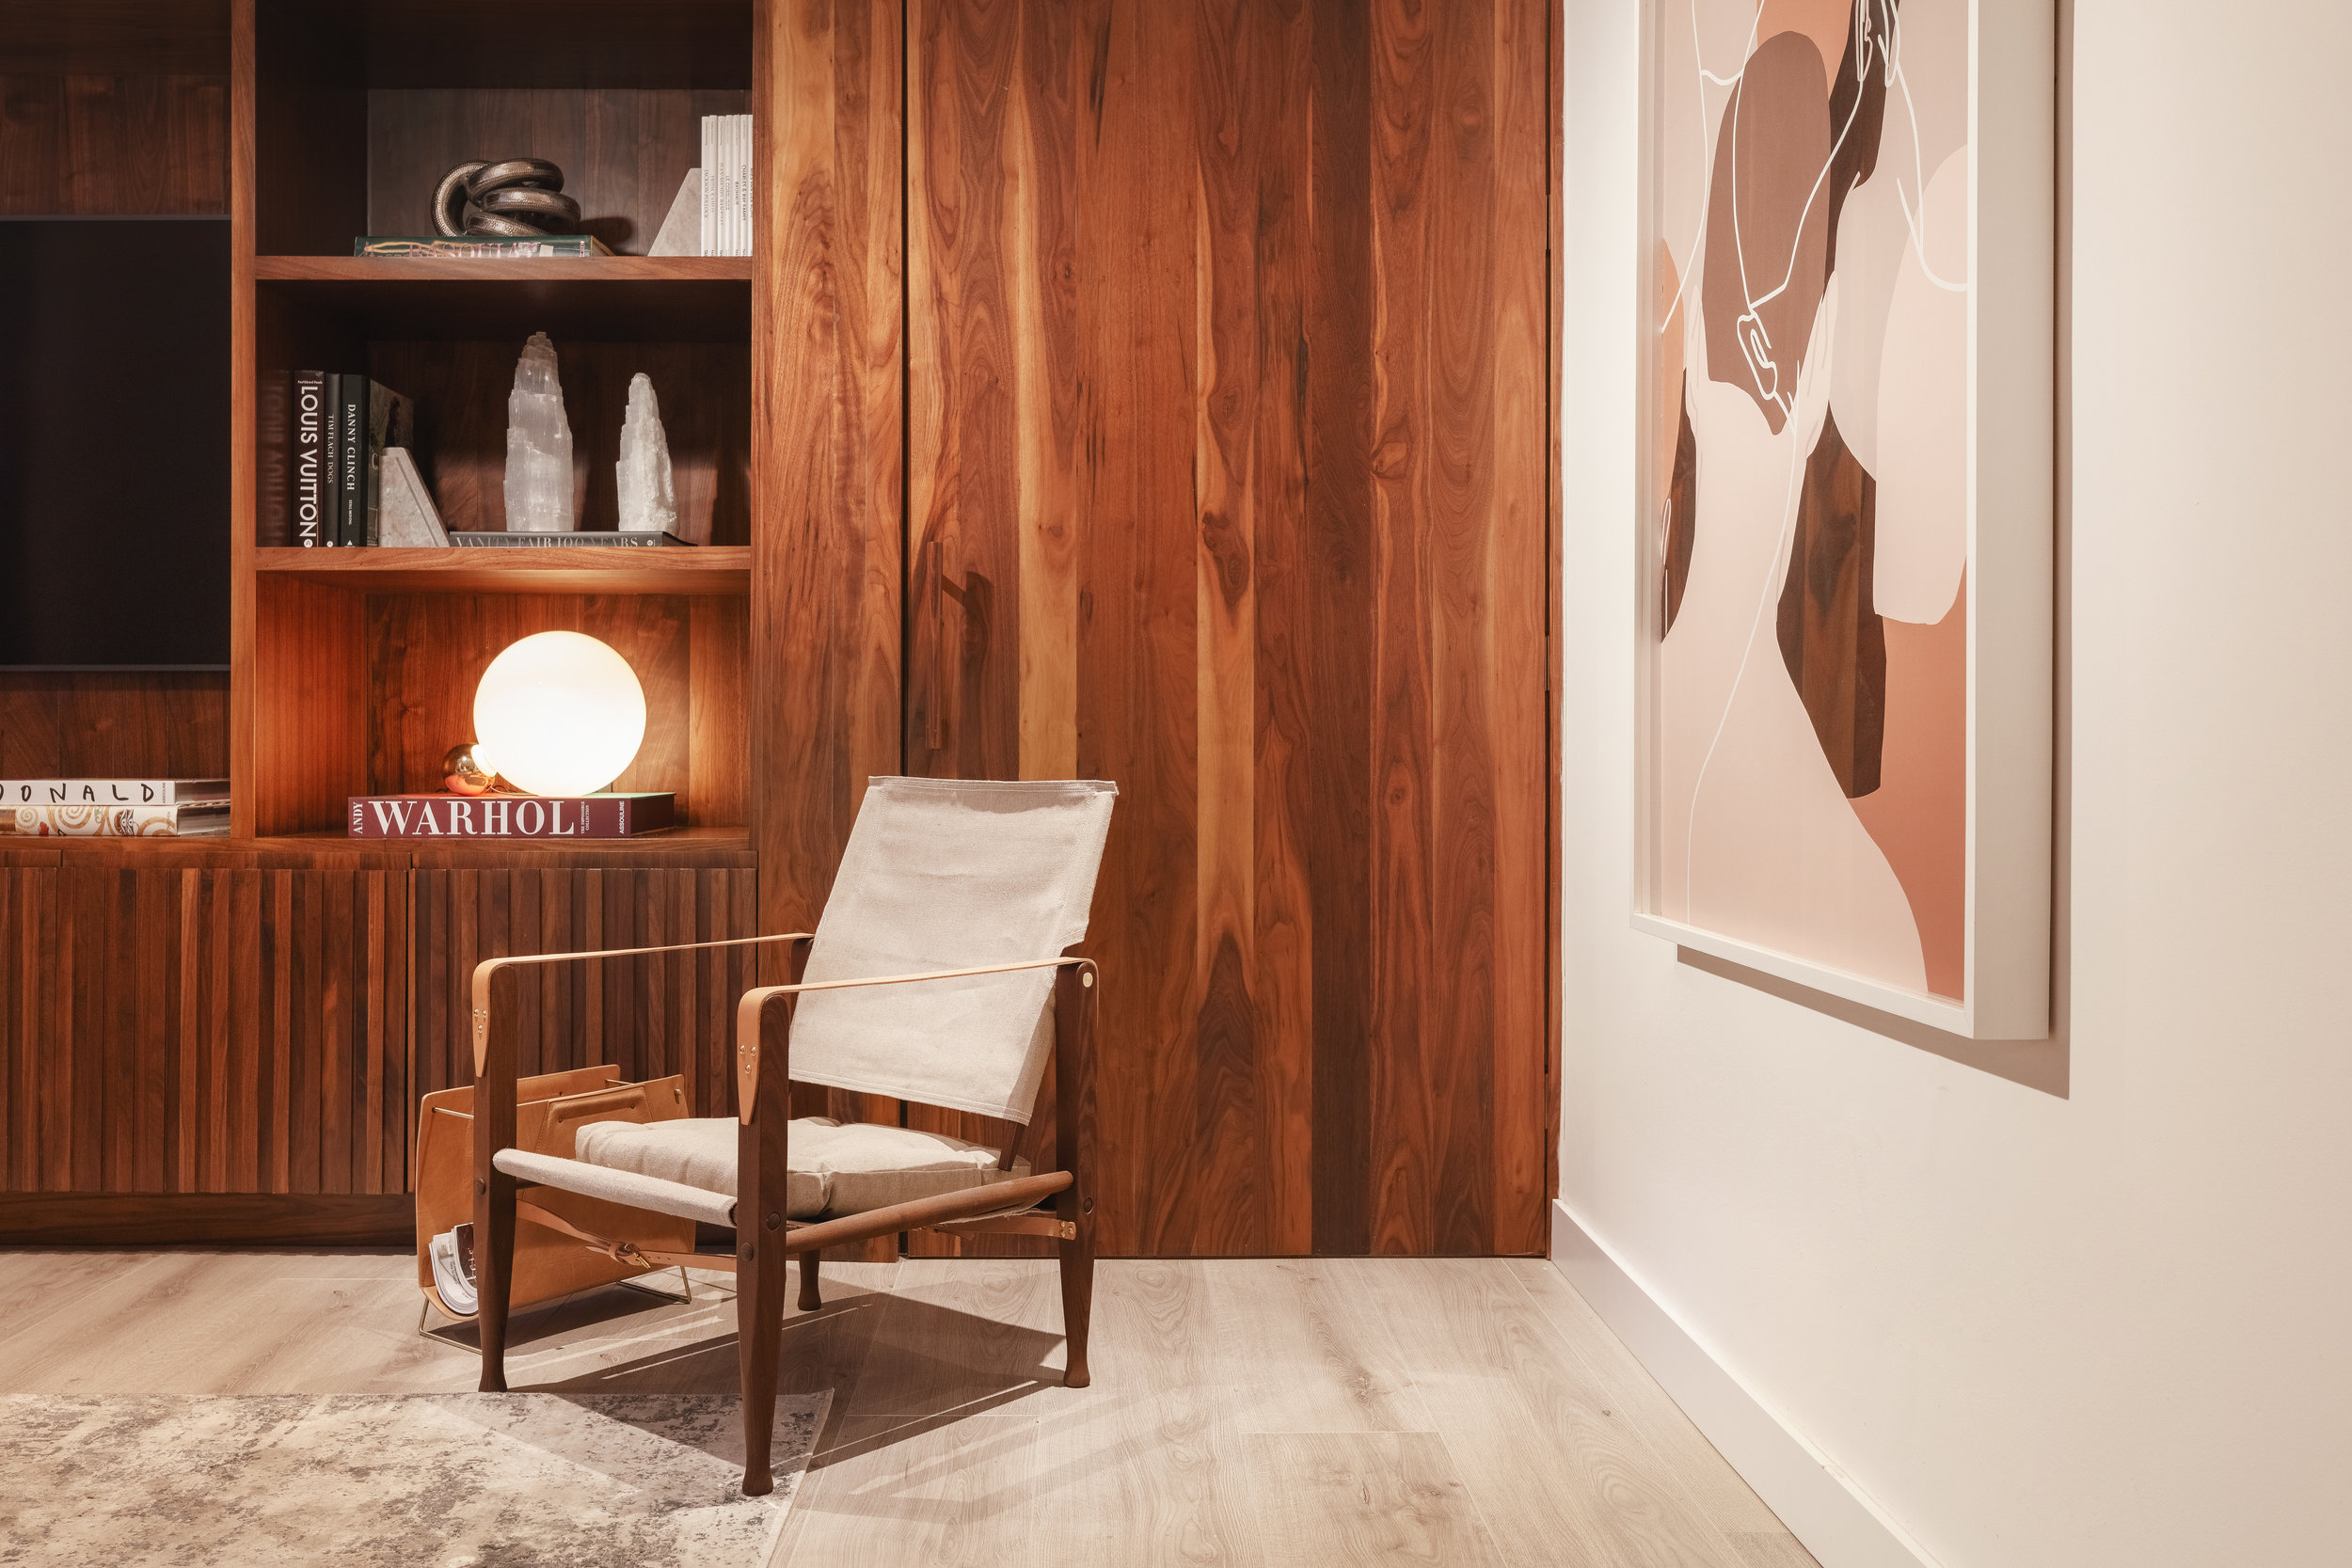 Concrete ideas, contemporary architecture, detailed interiors. -